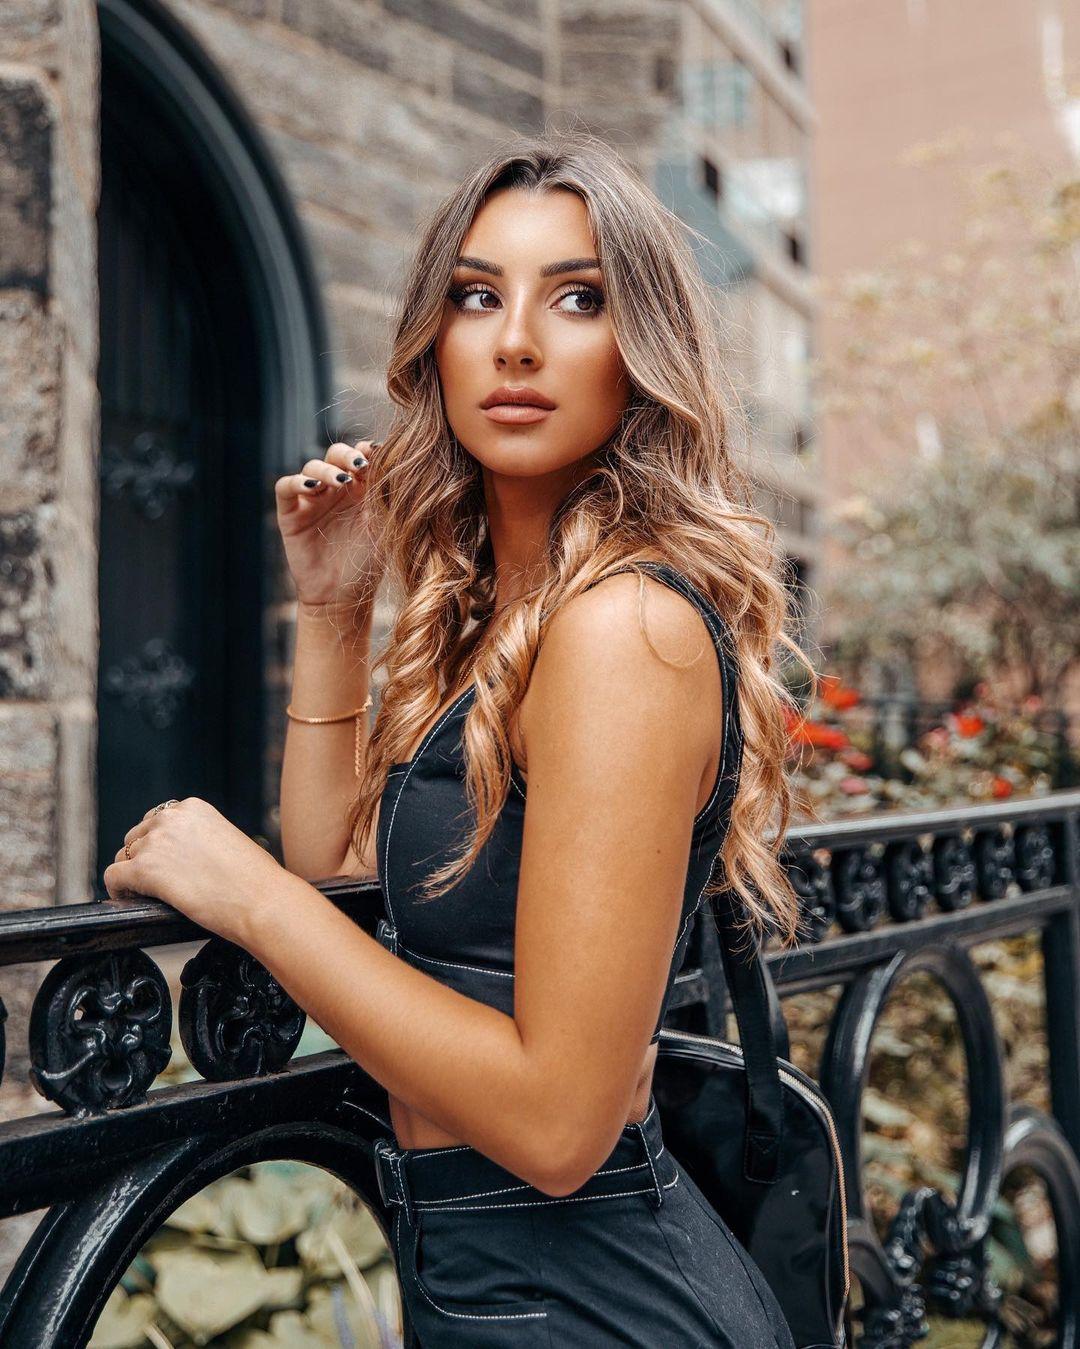 Adrianna-Atiles-Wallpapers-Insta-Fit-Bio-7